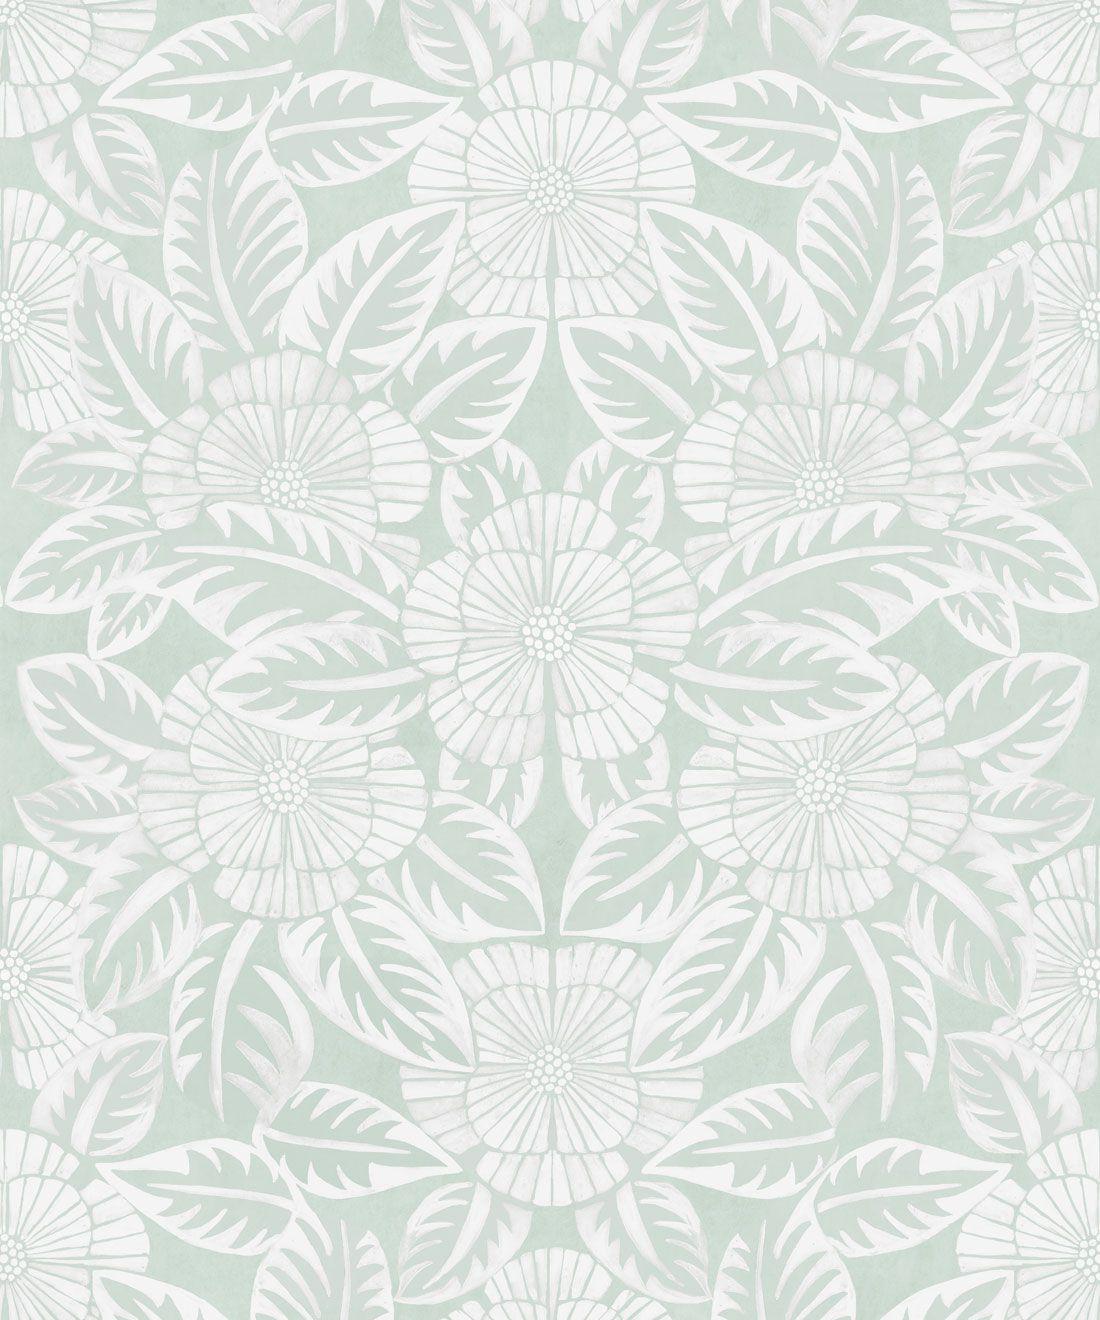 Calcutta Wallpaper • Flower and Leaf Motif Design • Ethnic Wallpaper • Aqua Wallpaper • Swatch